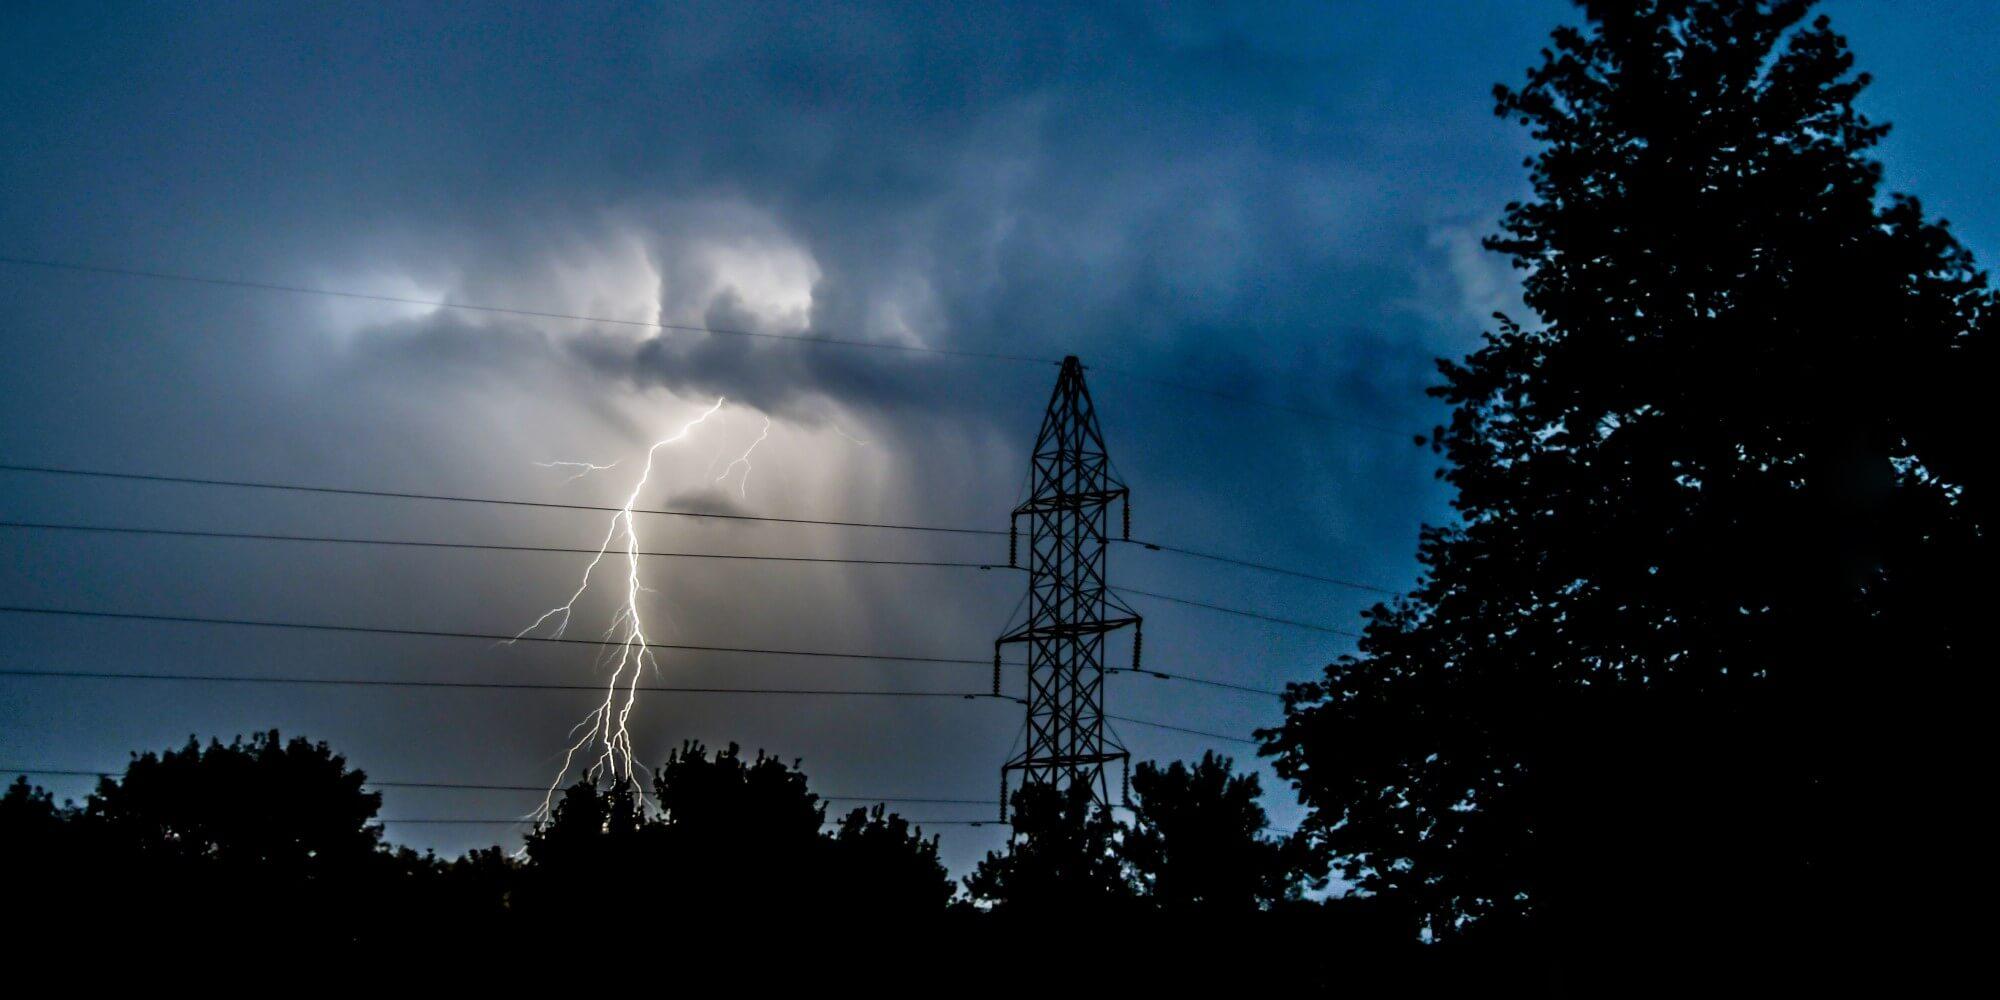 lightning bolt next to power lines